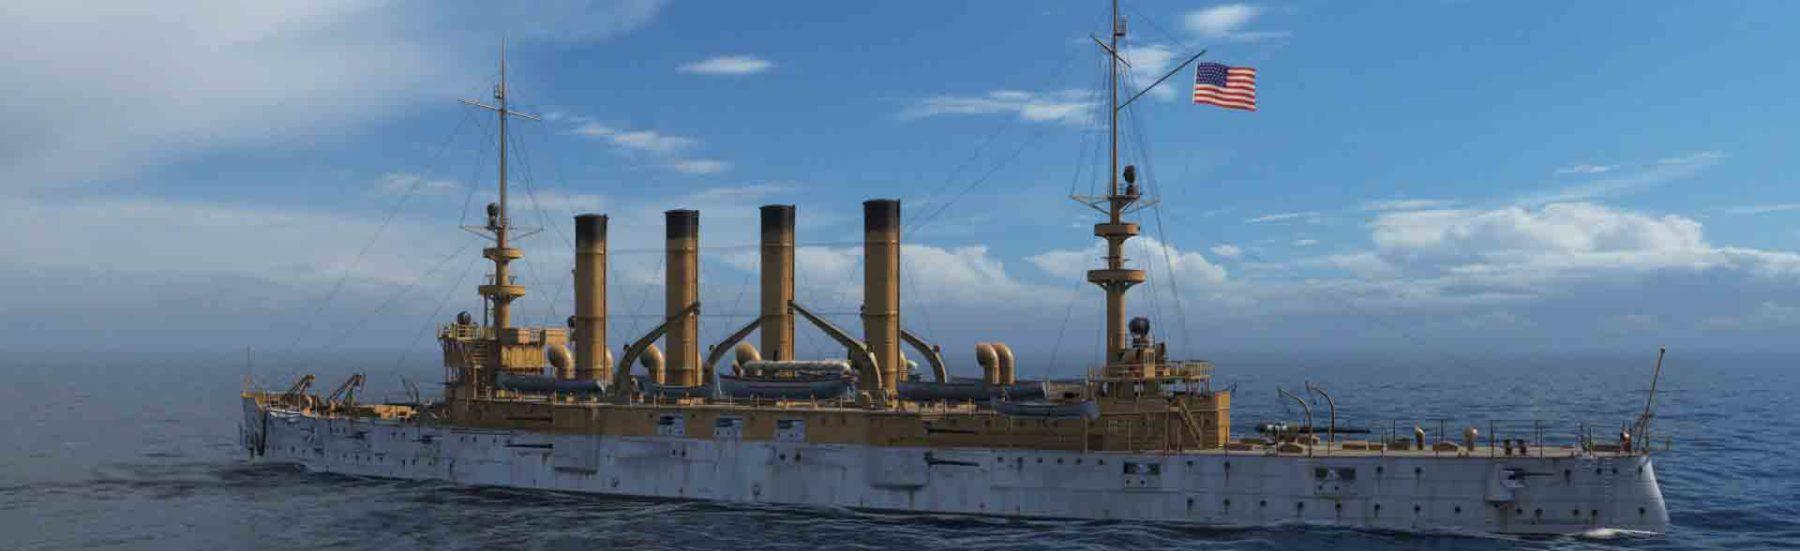 St Louis class cruisers (1904)